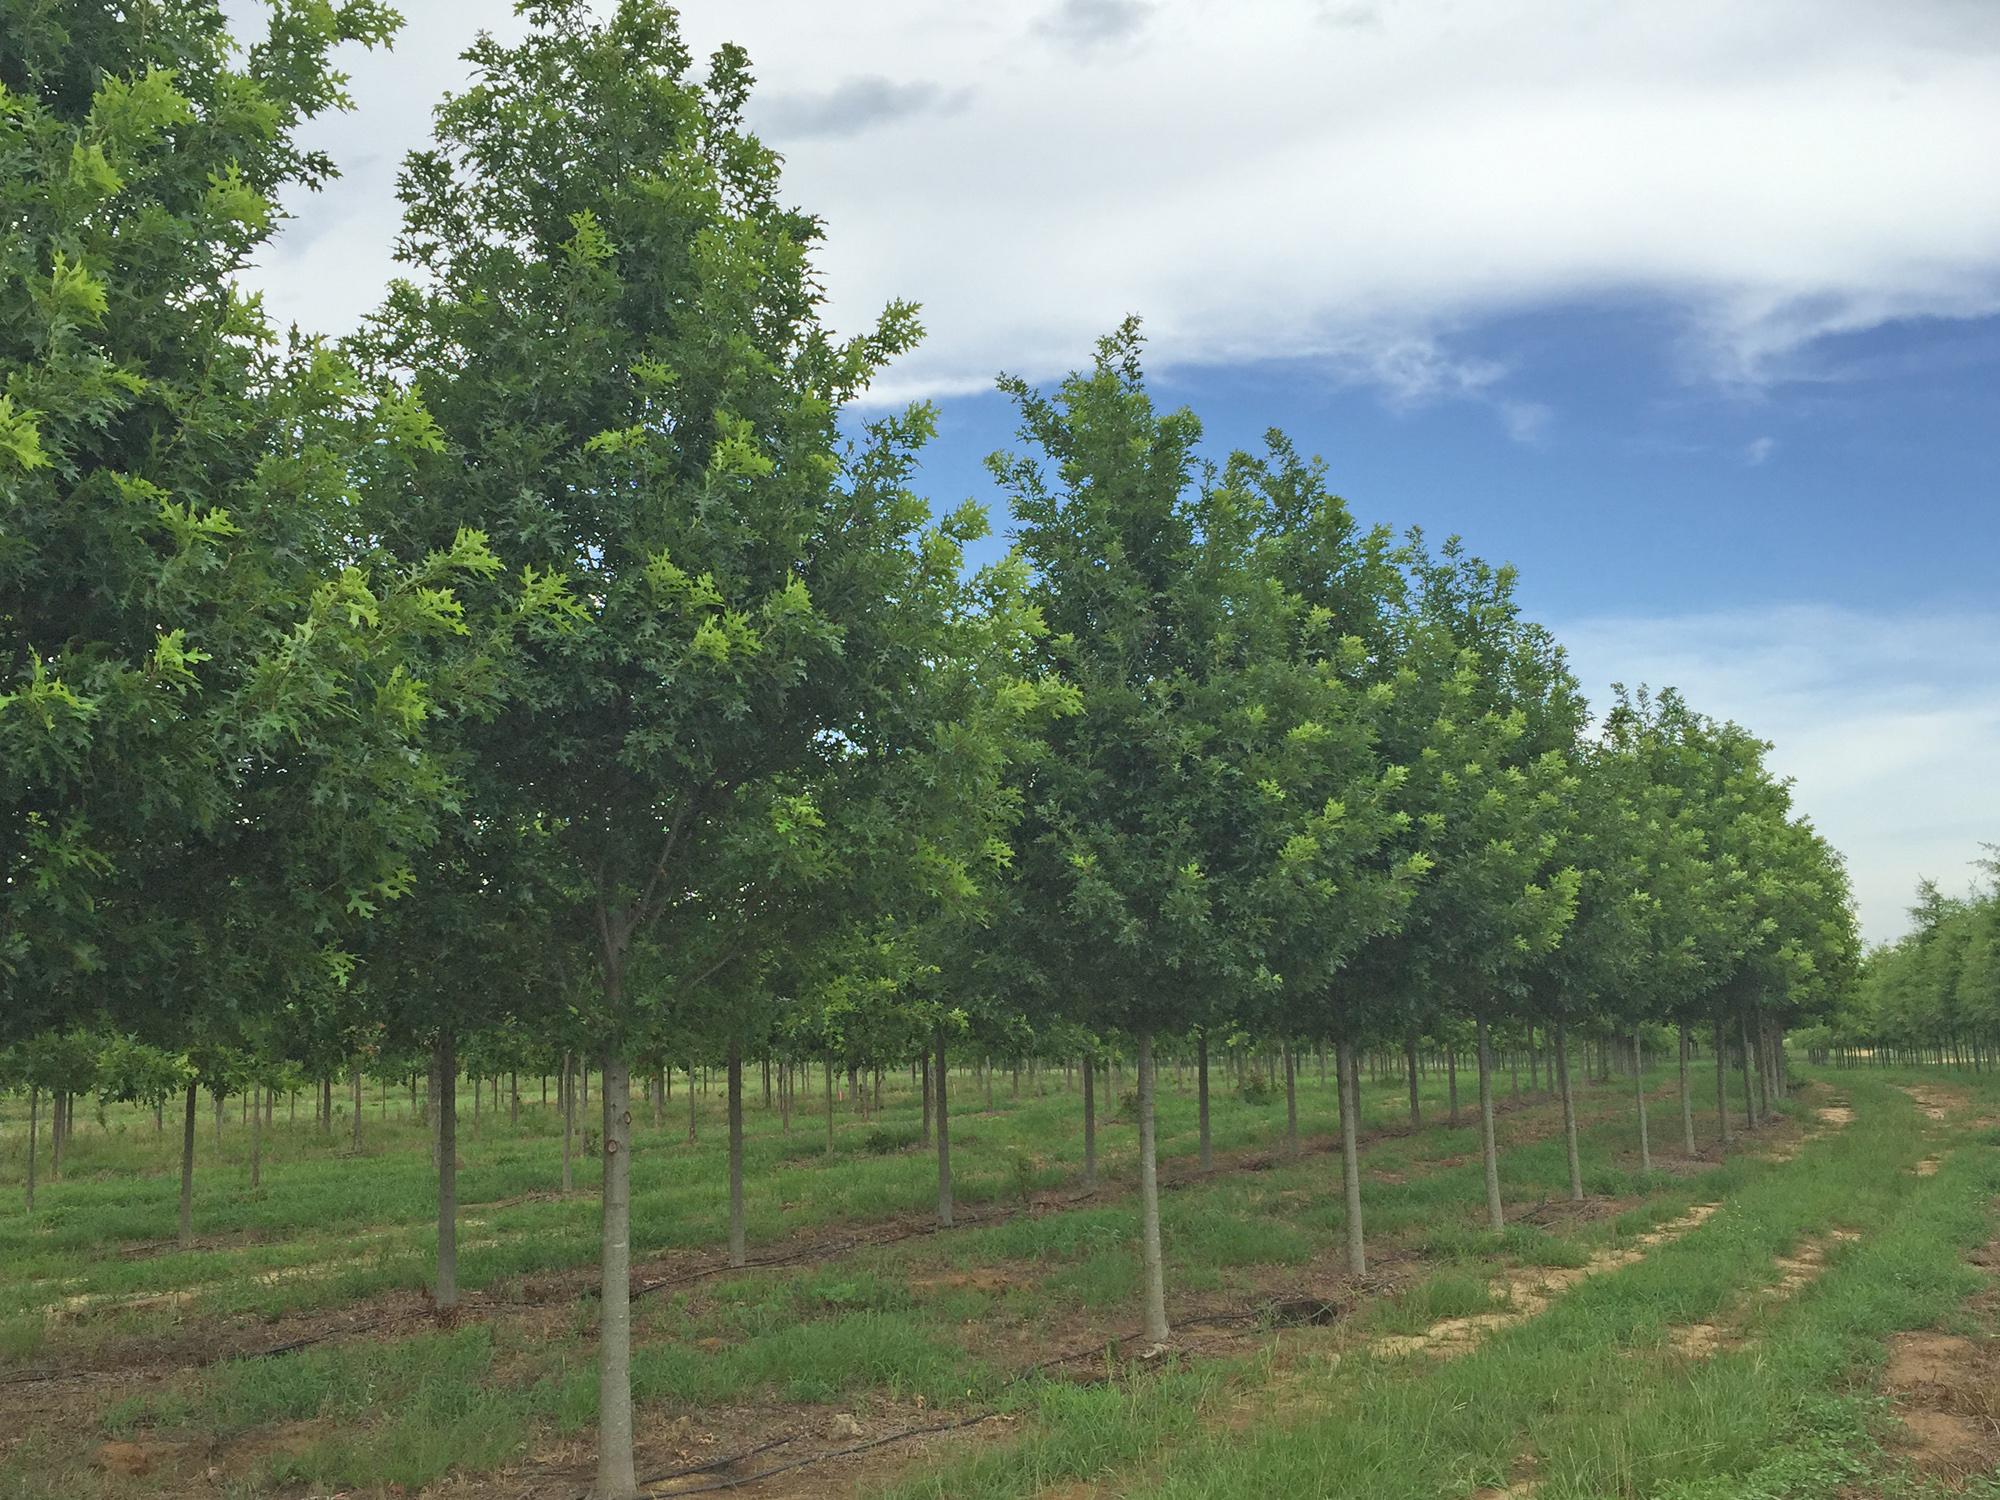 Breezeway-Nuttall-Oak-Quercus-nuttallii-row.jpg